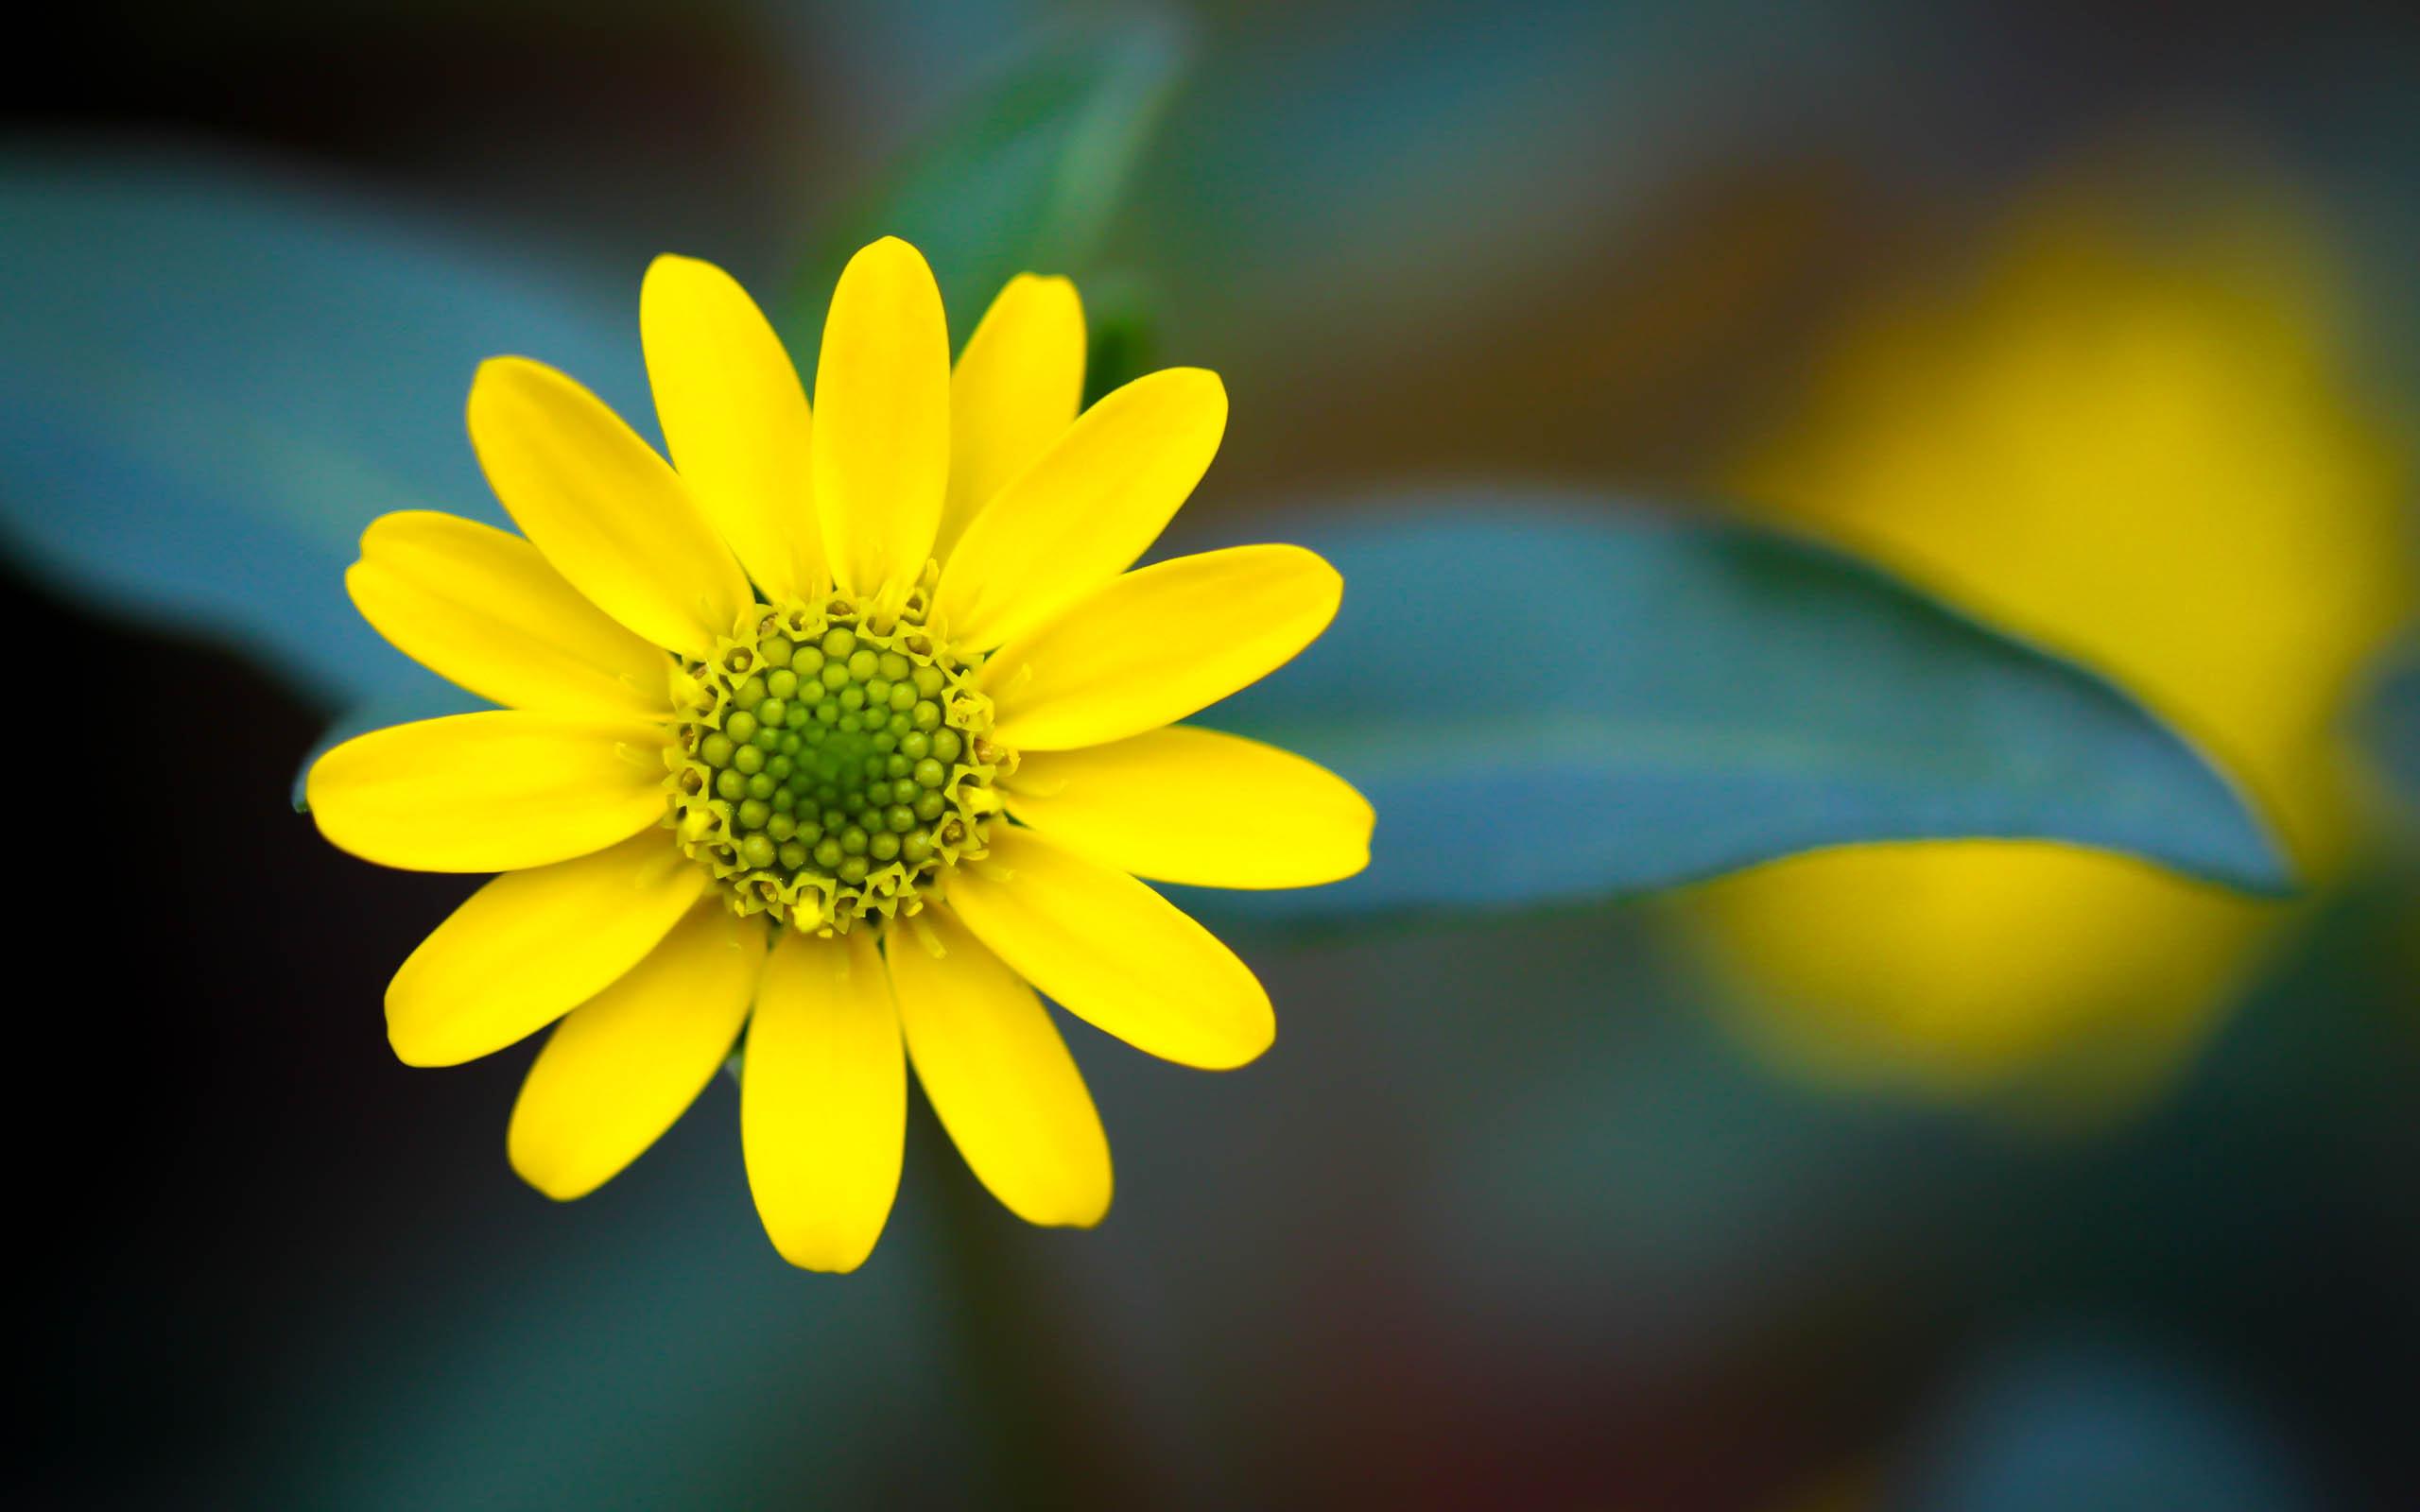 Macro Flowers Hd Yellow - HD Desktop Wallpapers